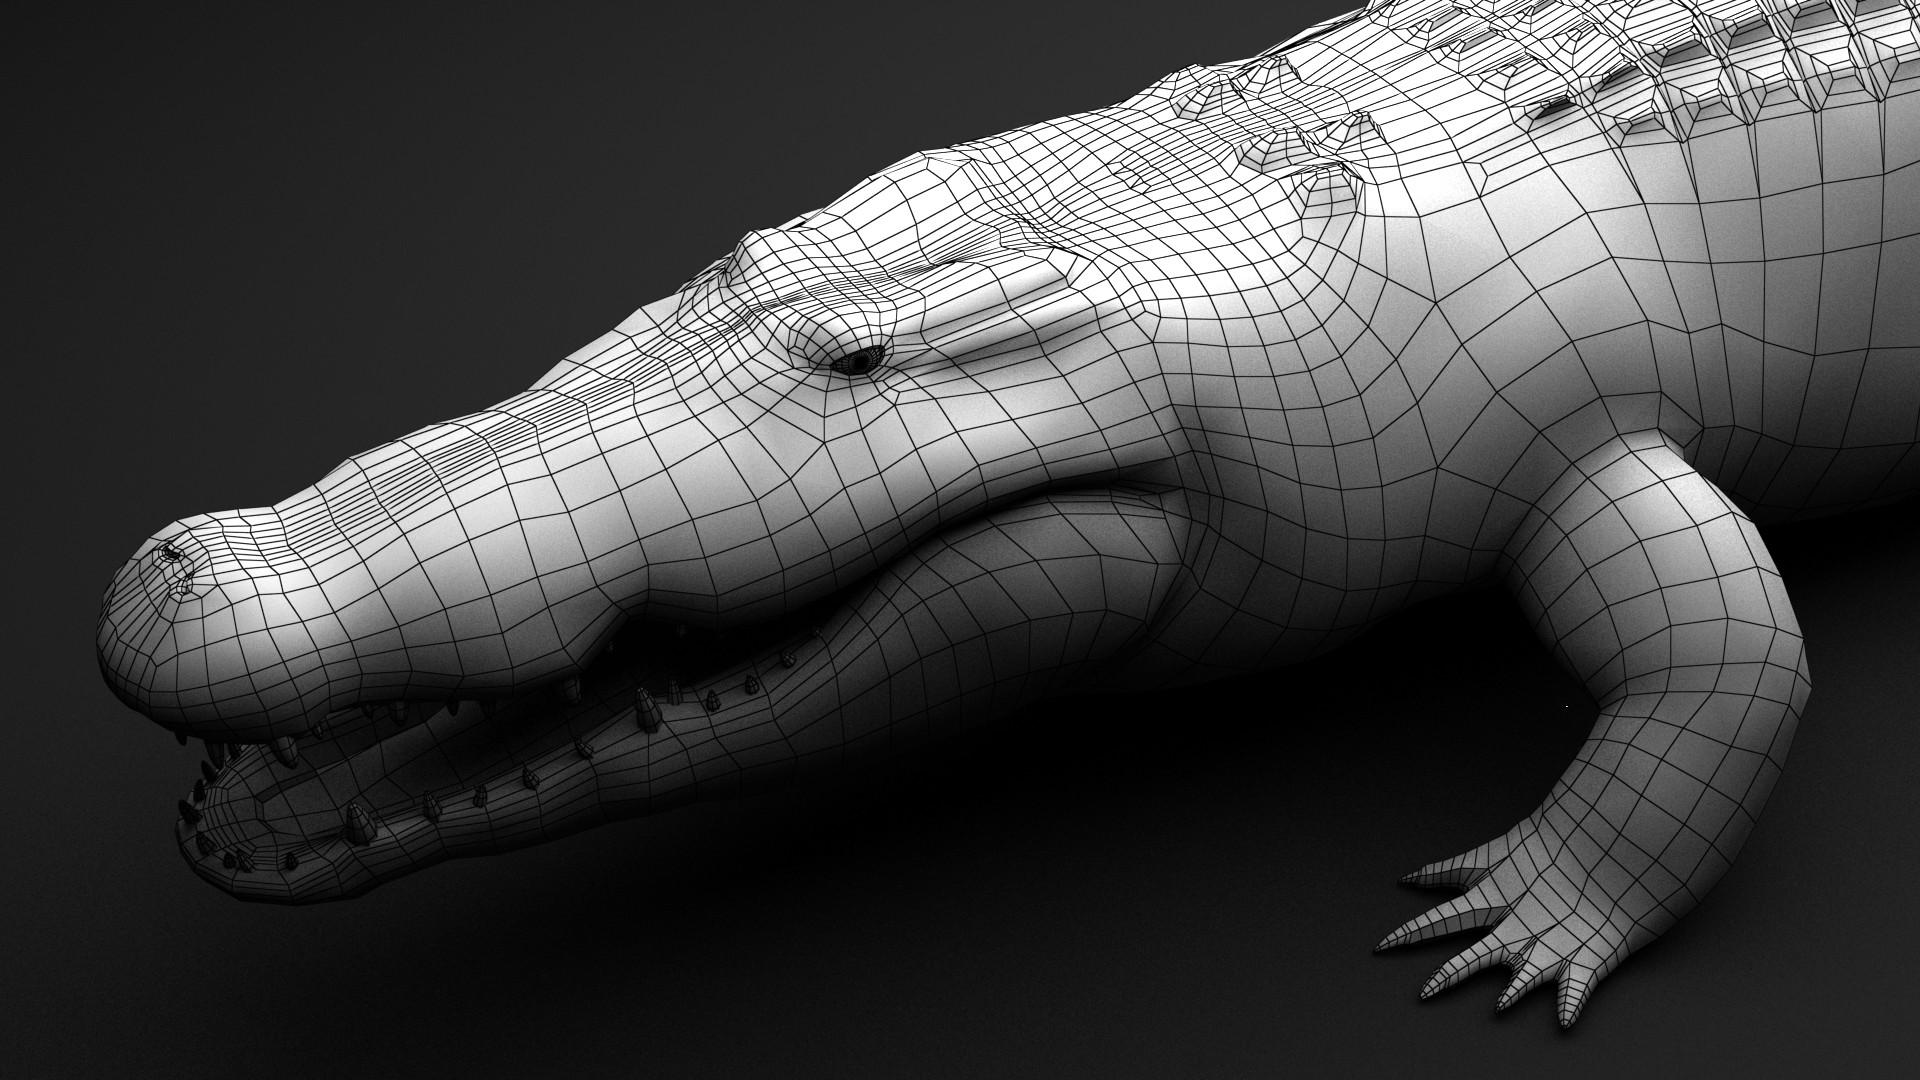 Dmytro Teslenko Crocodile modeling timelapse